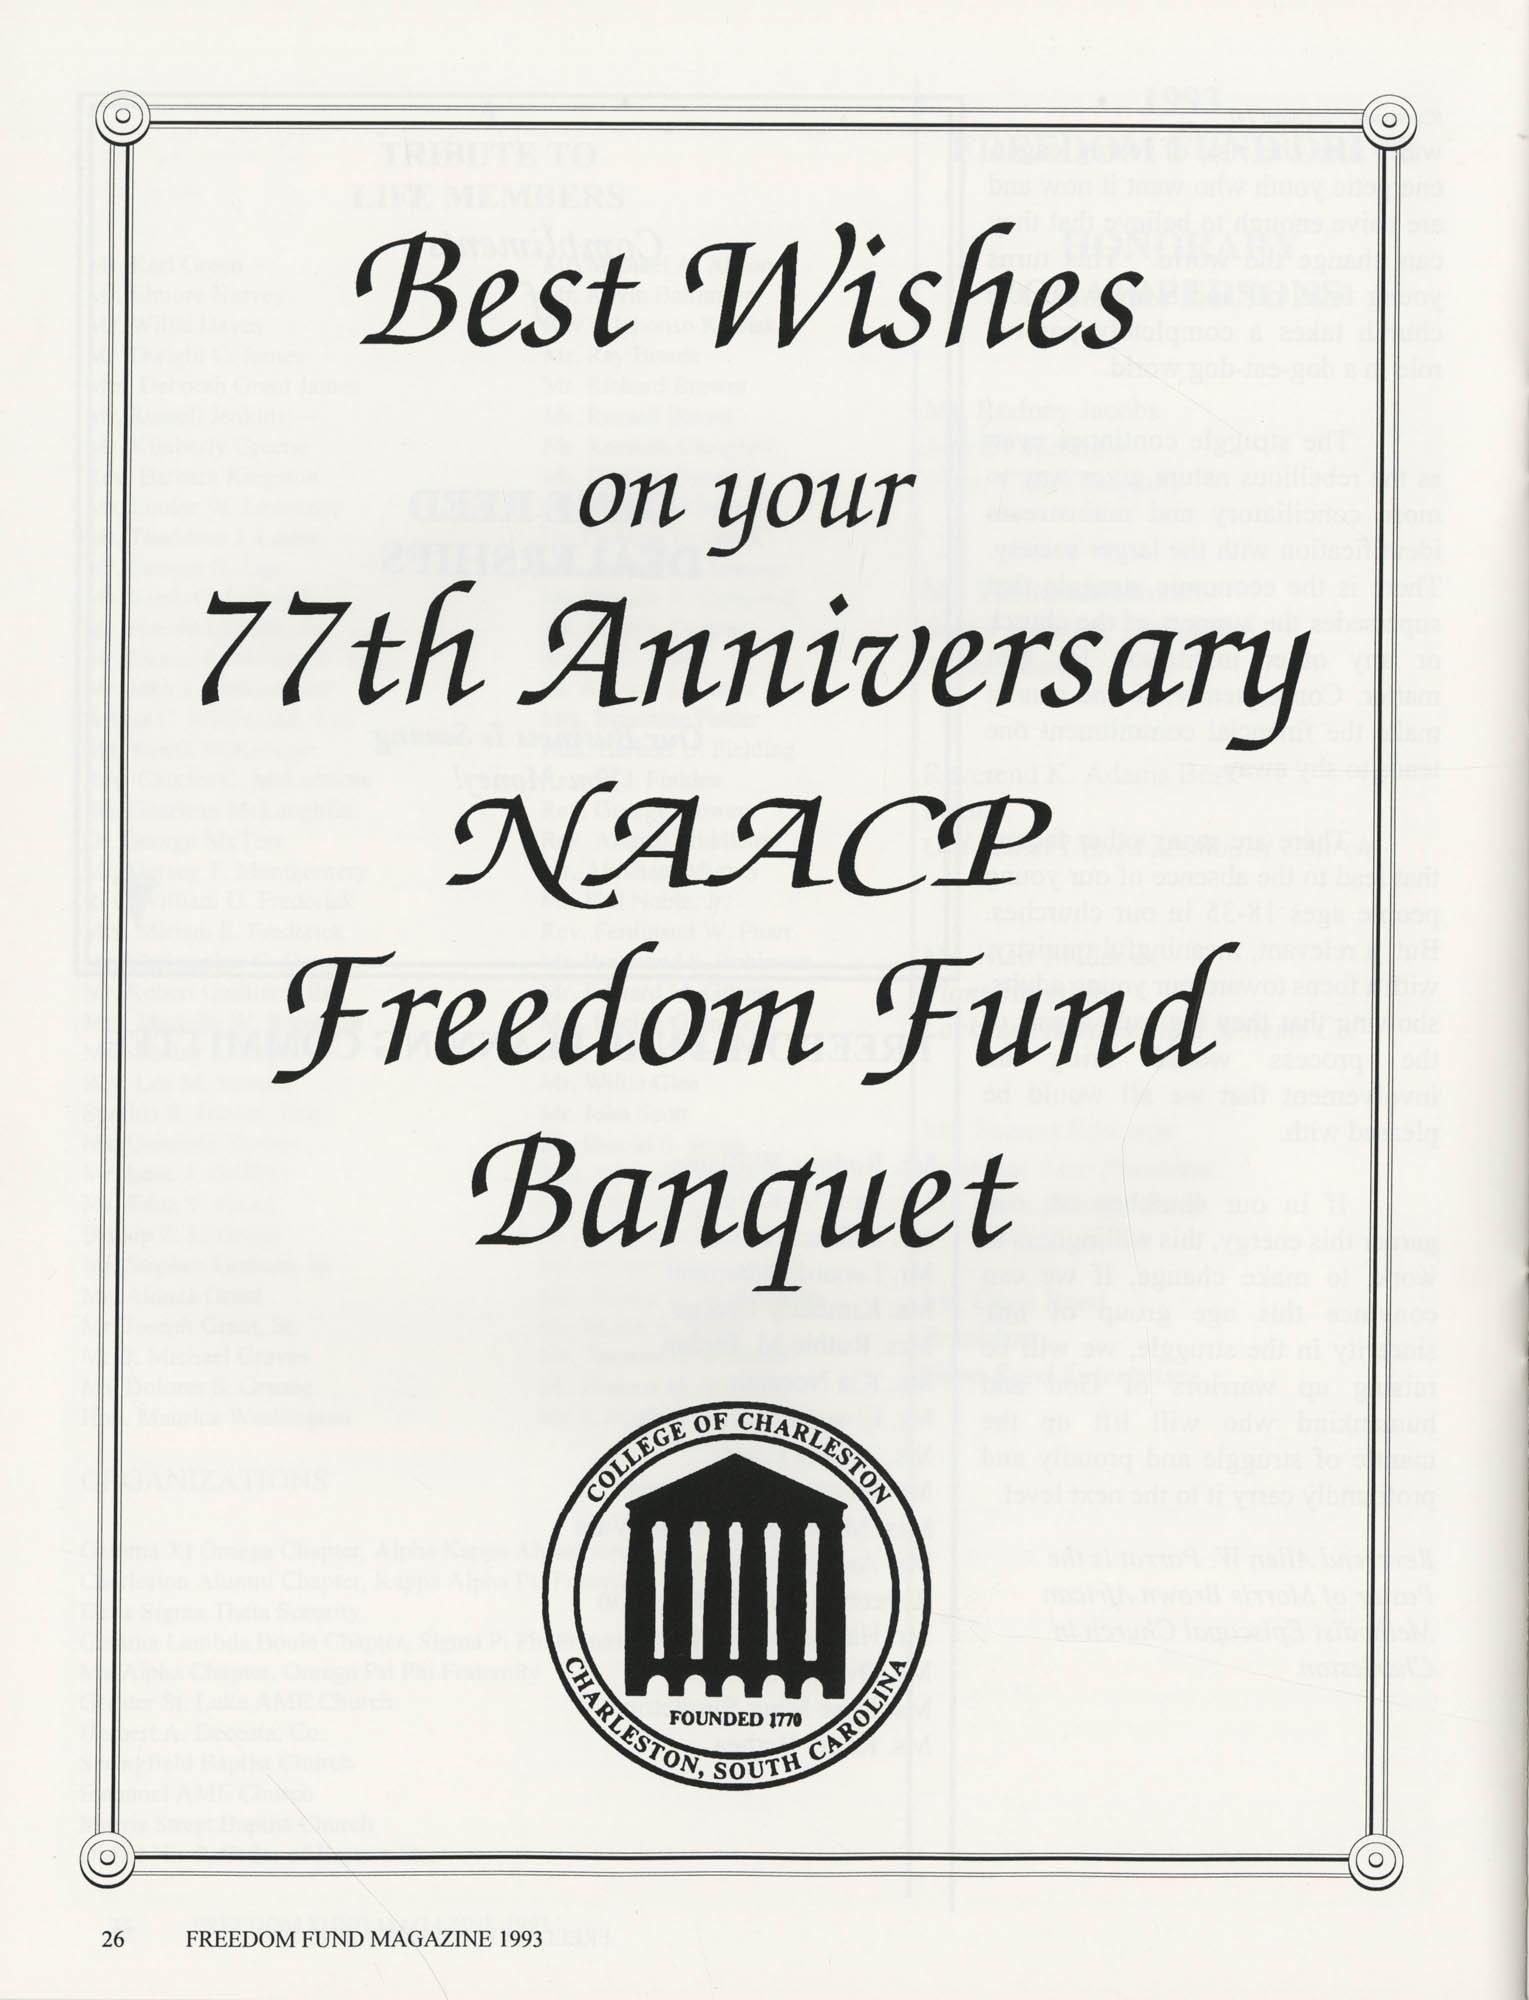 Freedom Fund Magazine, 1993, Page 26